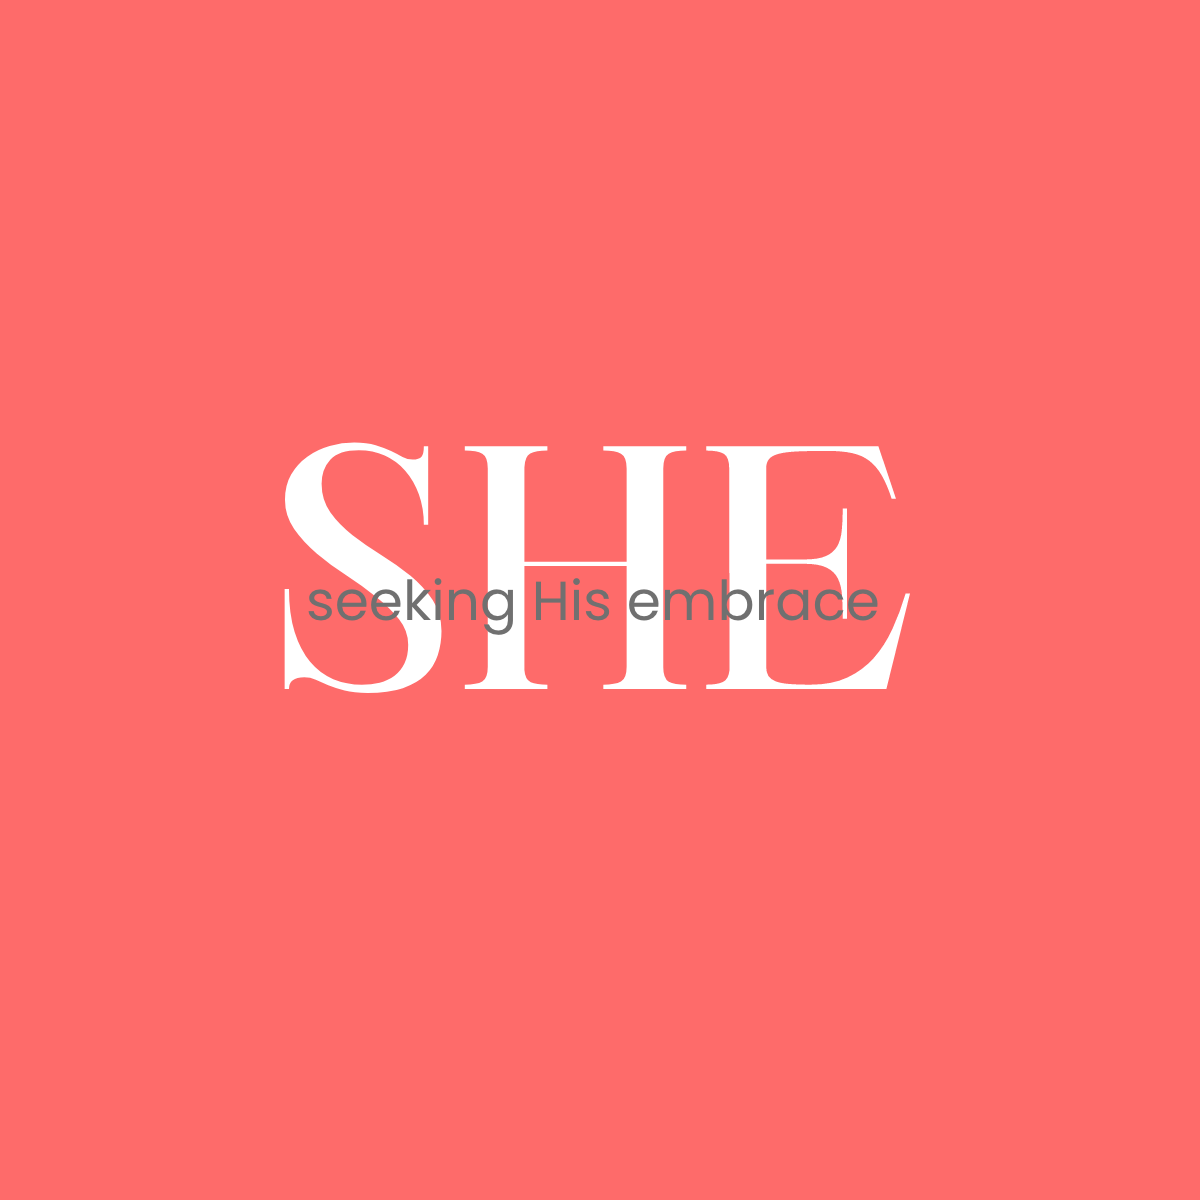 https://sherevolution.com/wp-content/uploads/2021/06/3-pink-she.png